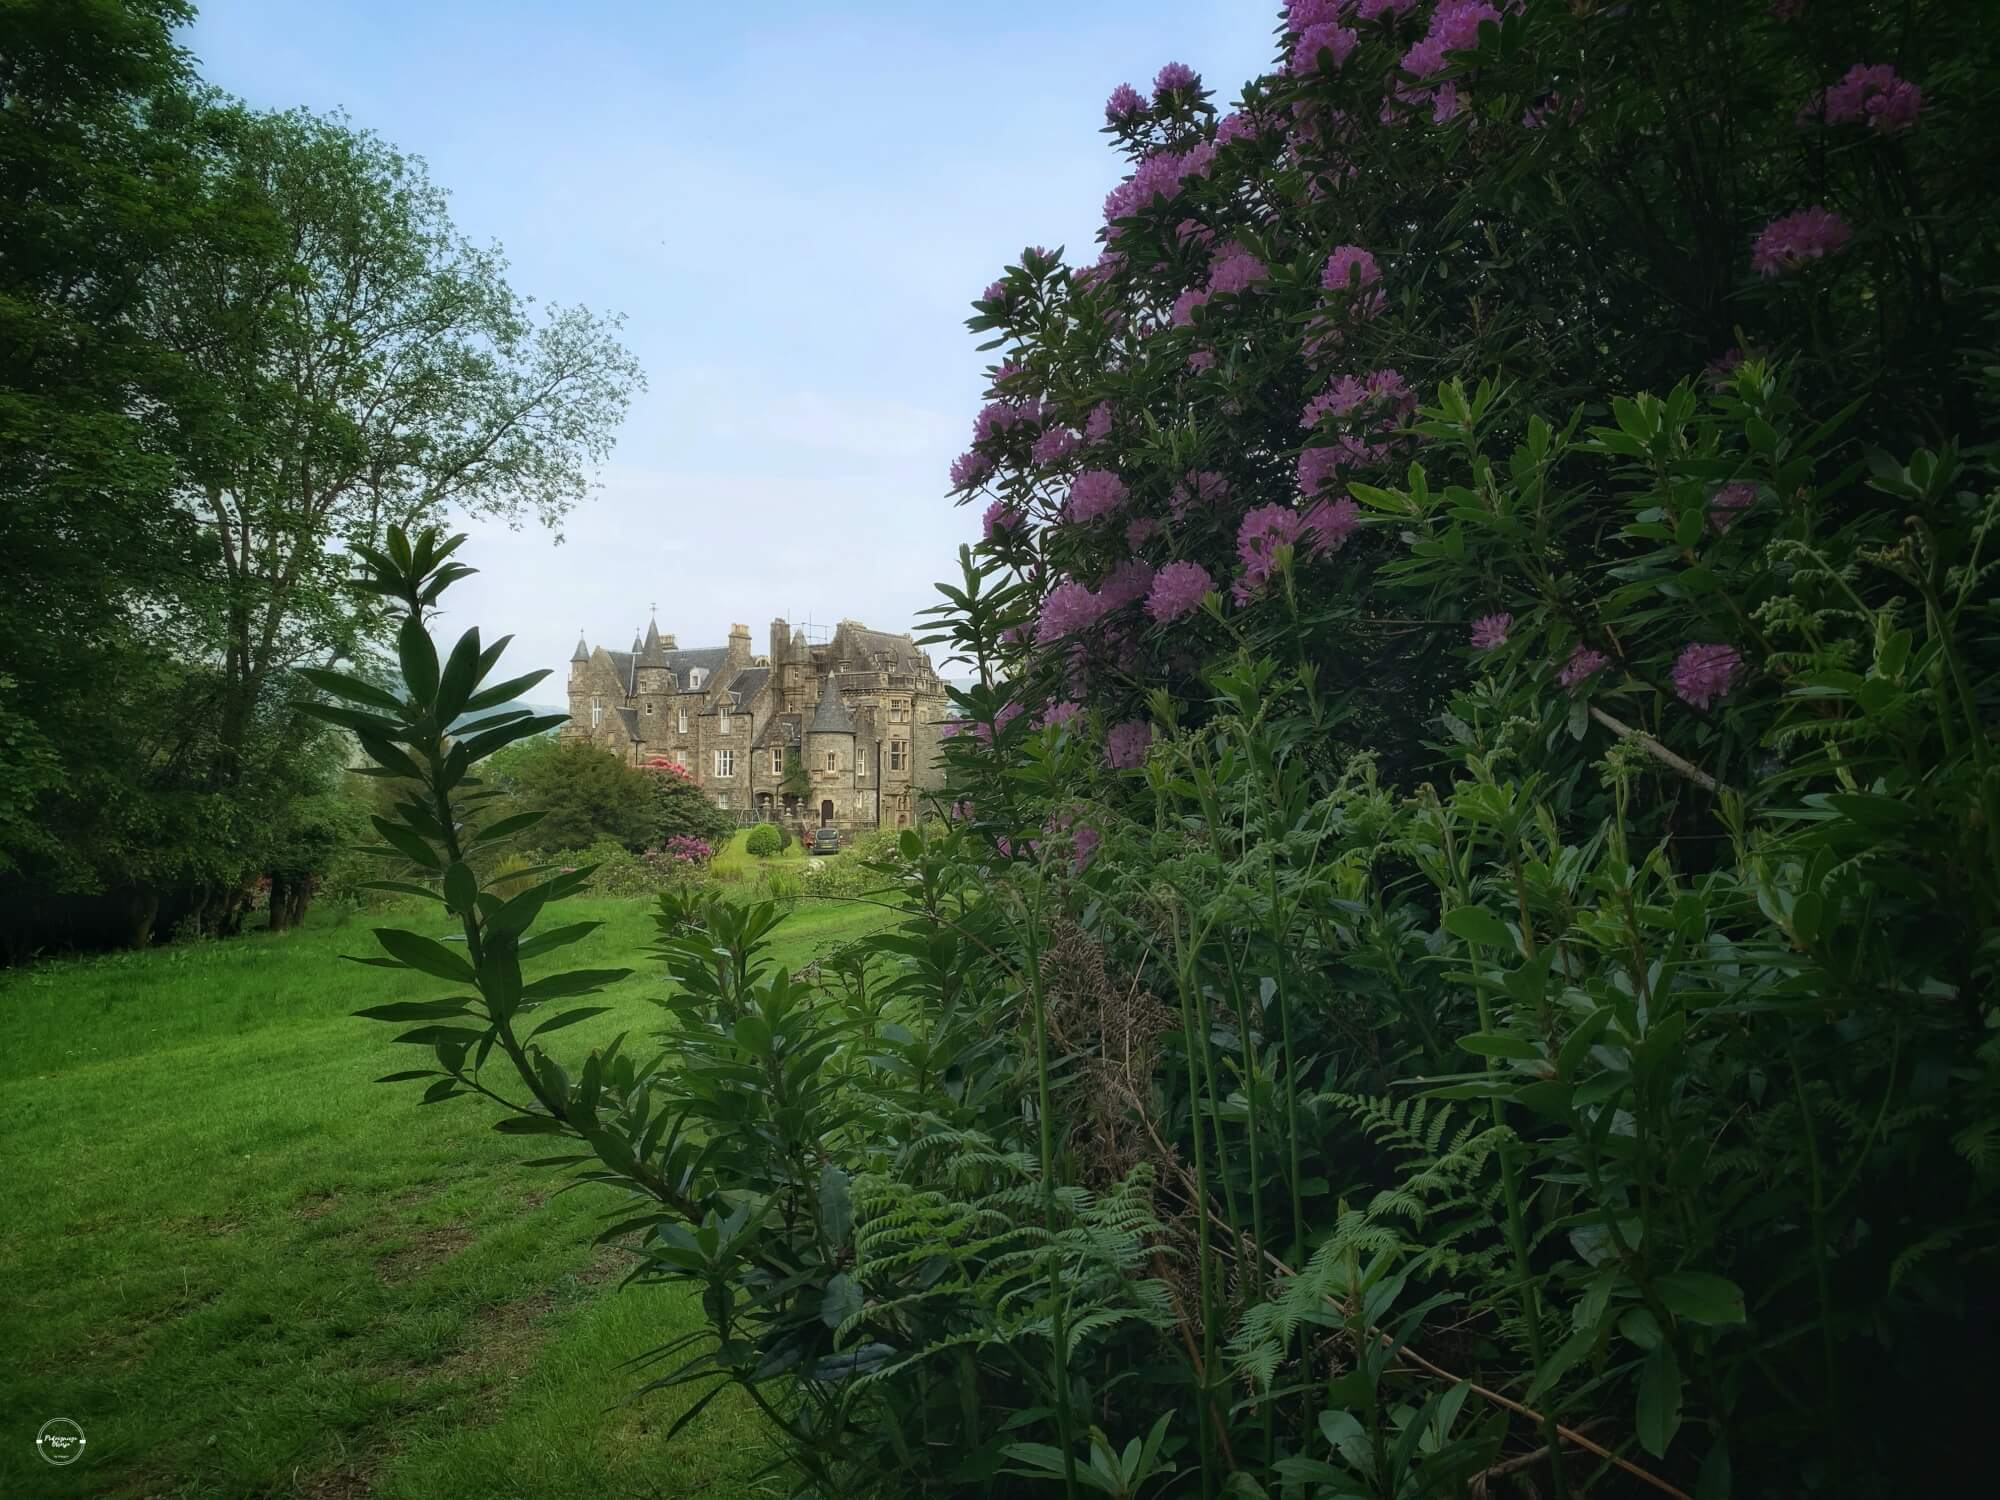 Knockderry Castle